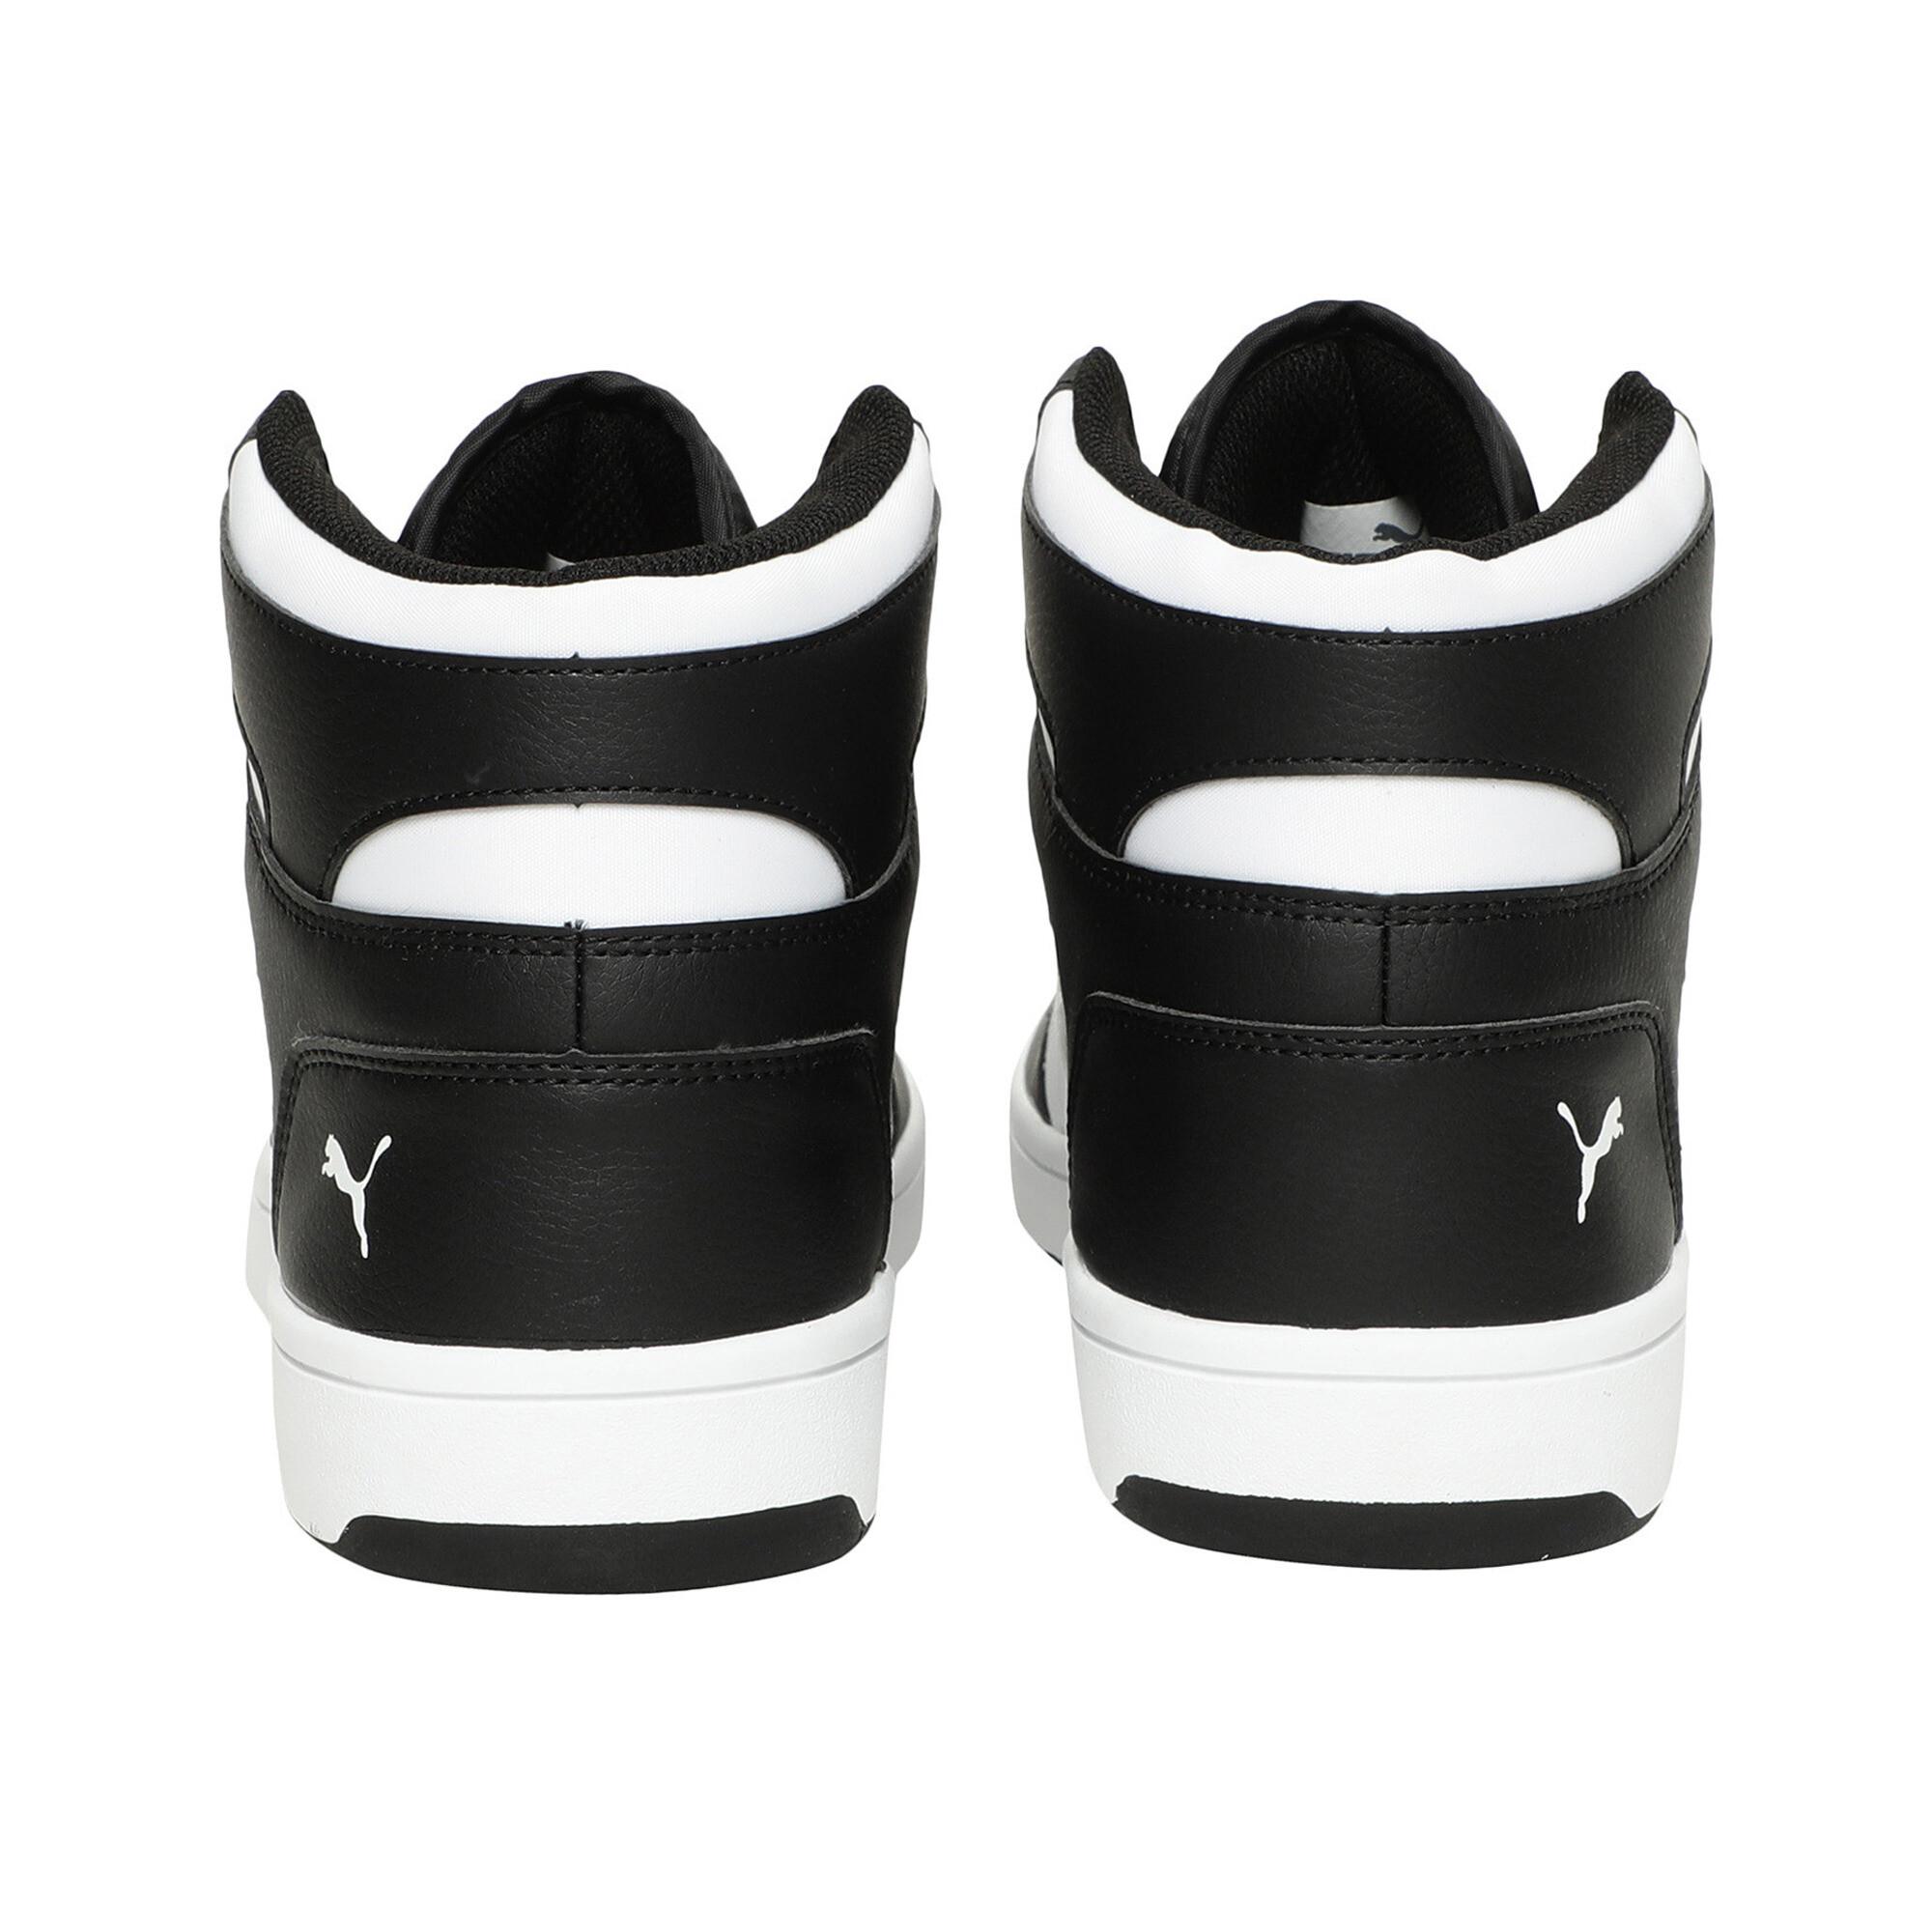 miniature 10 - Puma Men's Rebound LayUp Sneakers